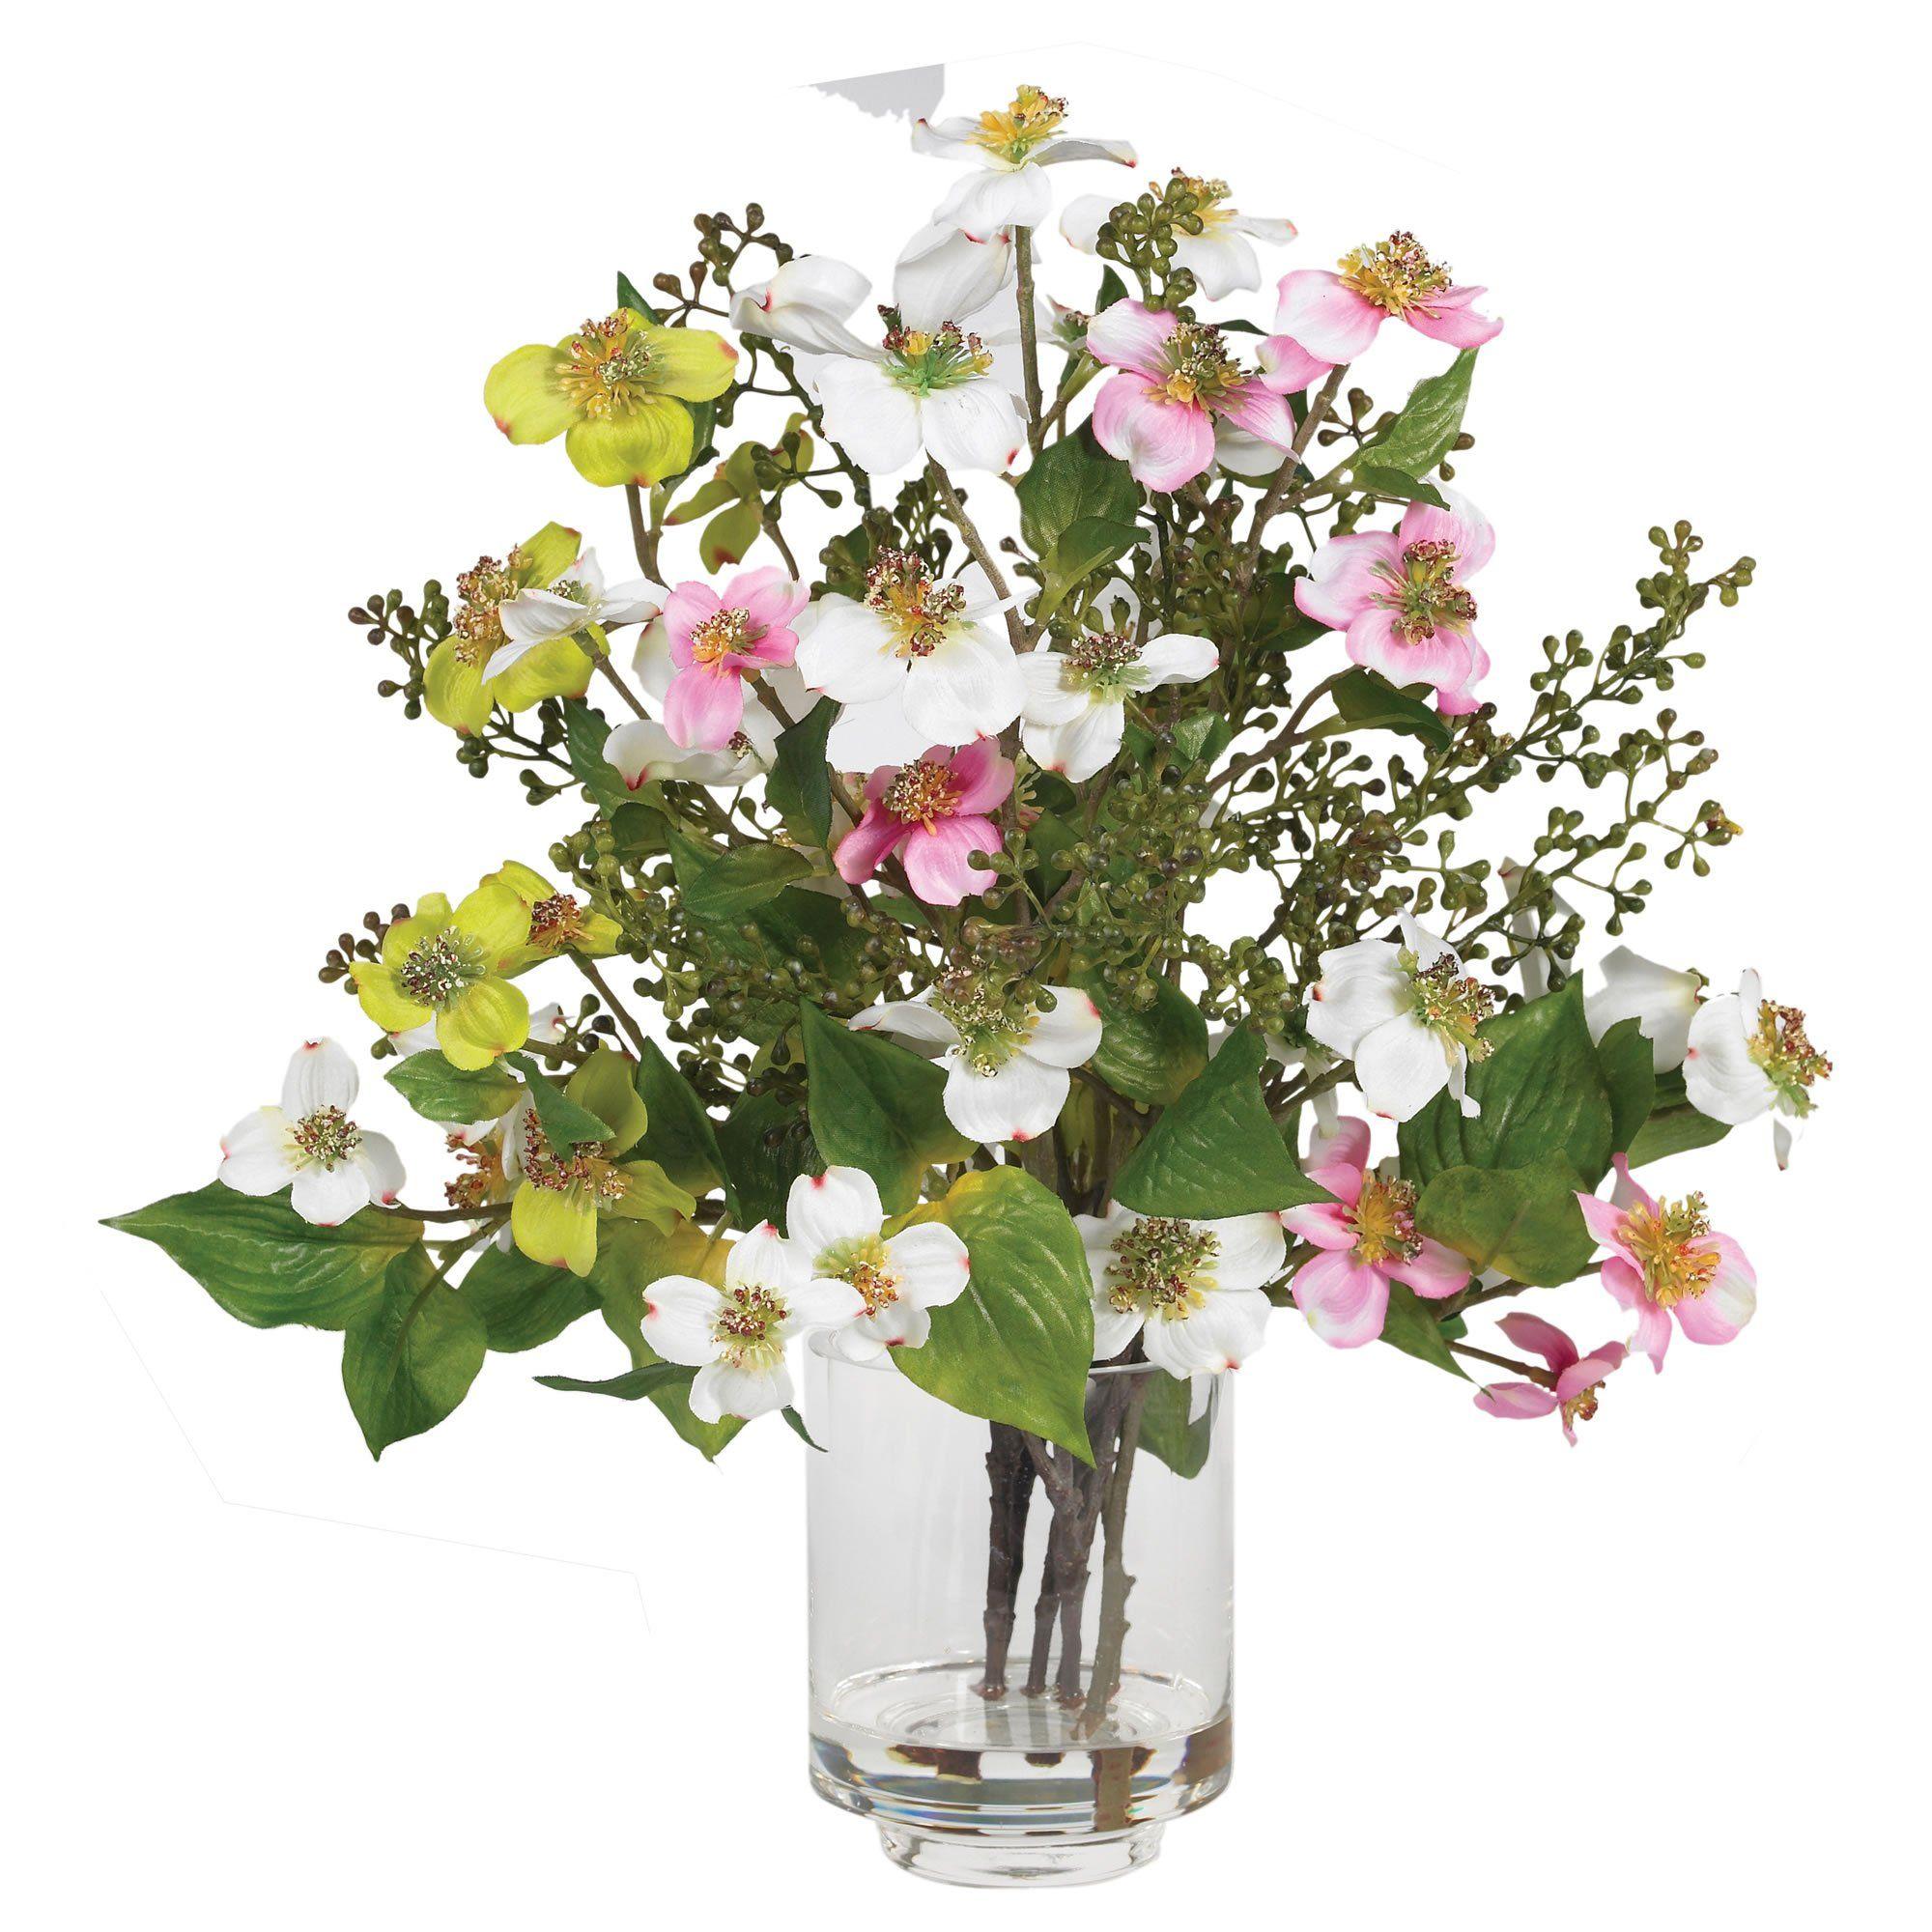 Dogwood Silk Flower Arrangement   Products   Pinterest